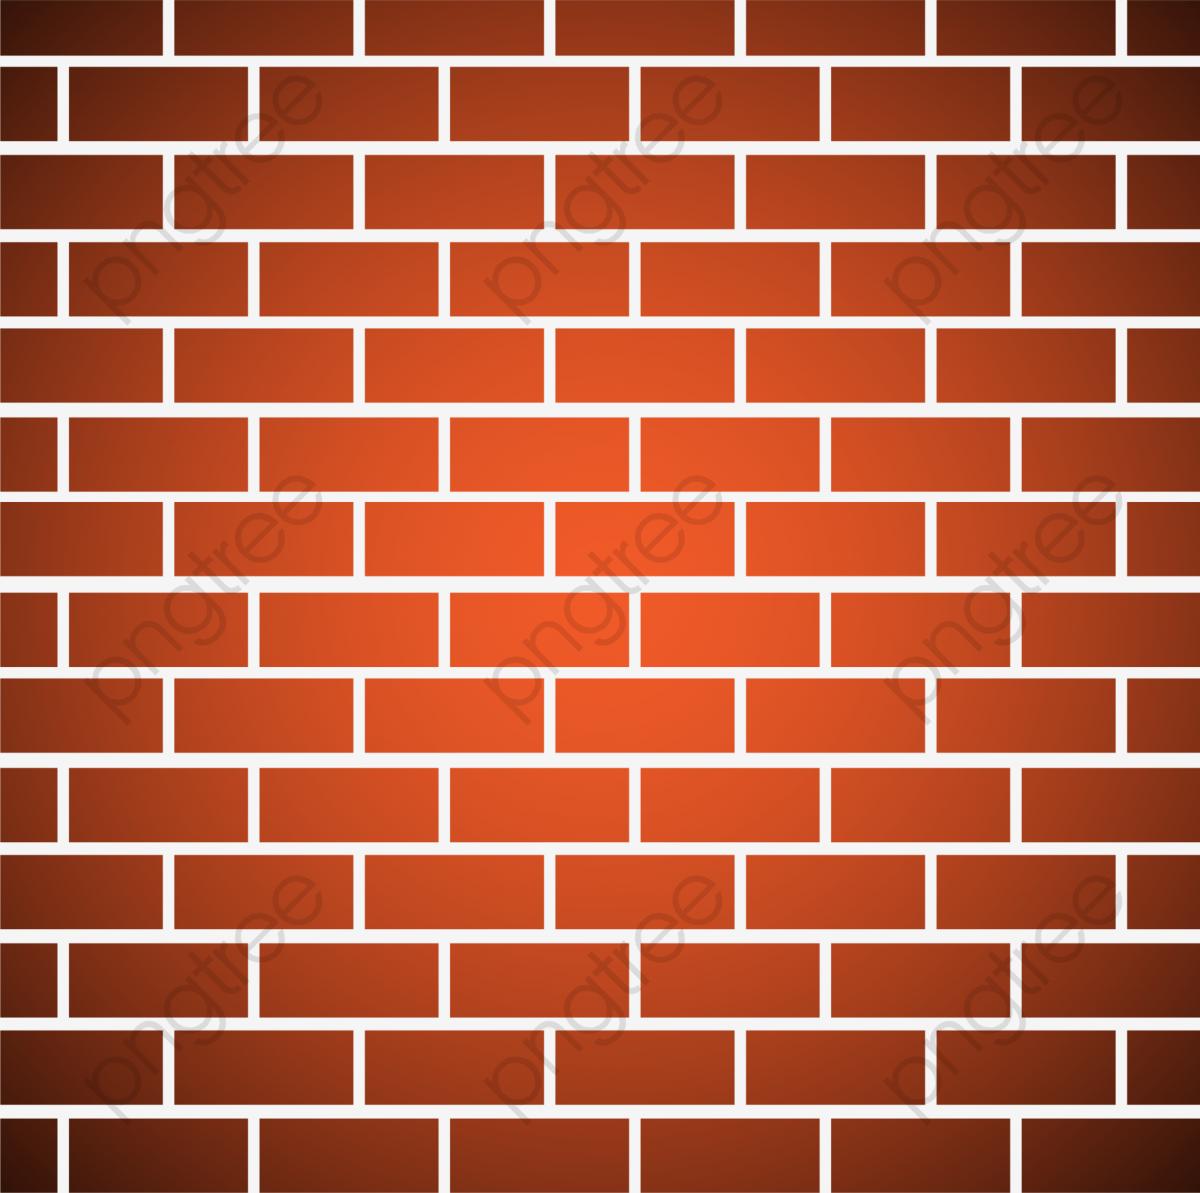 Orange Minimalist Brick Wall, Orange Clipart, Orange, Simple PNG.